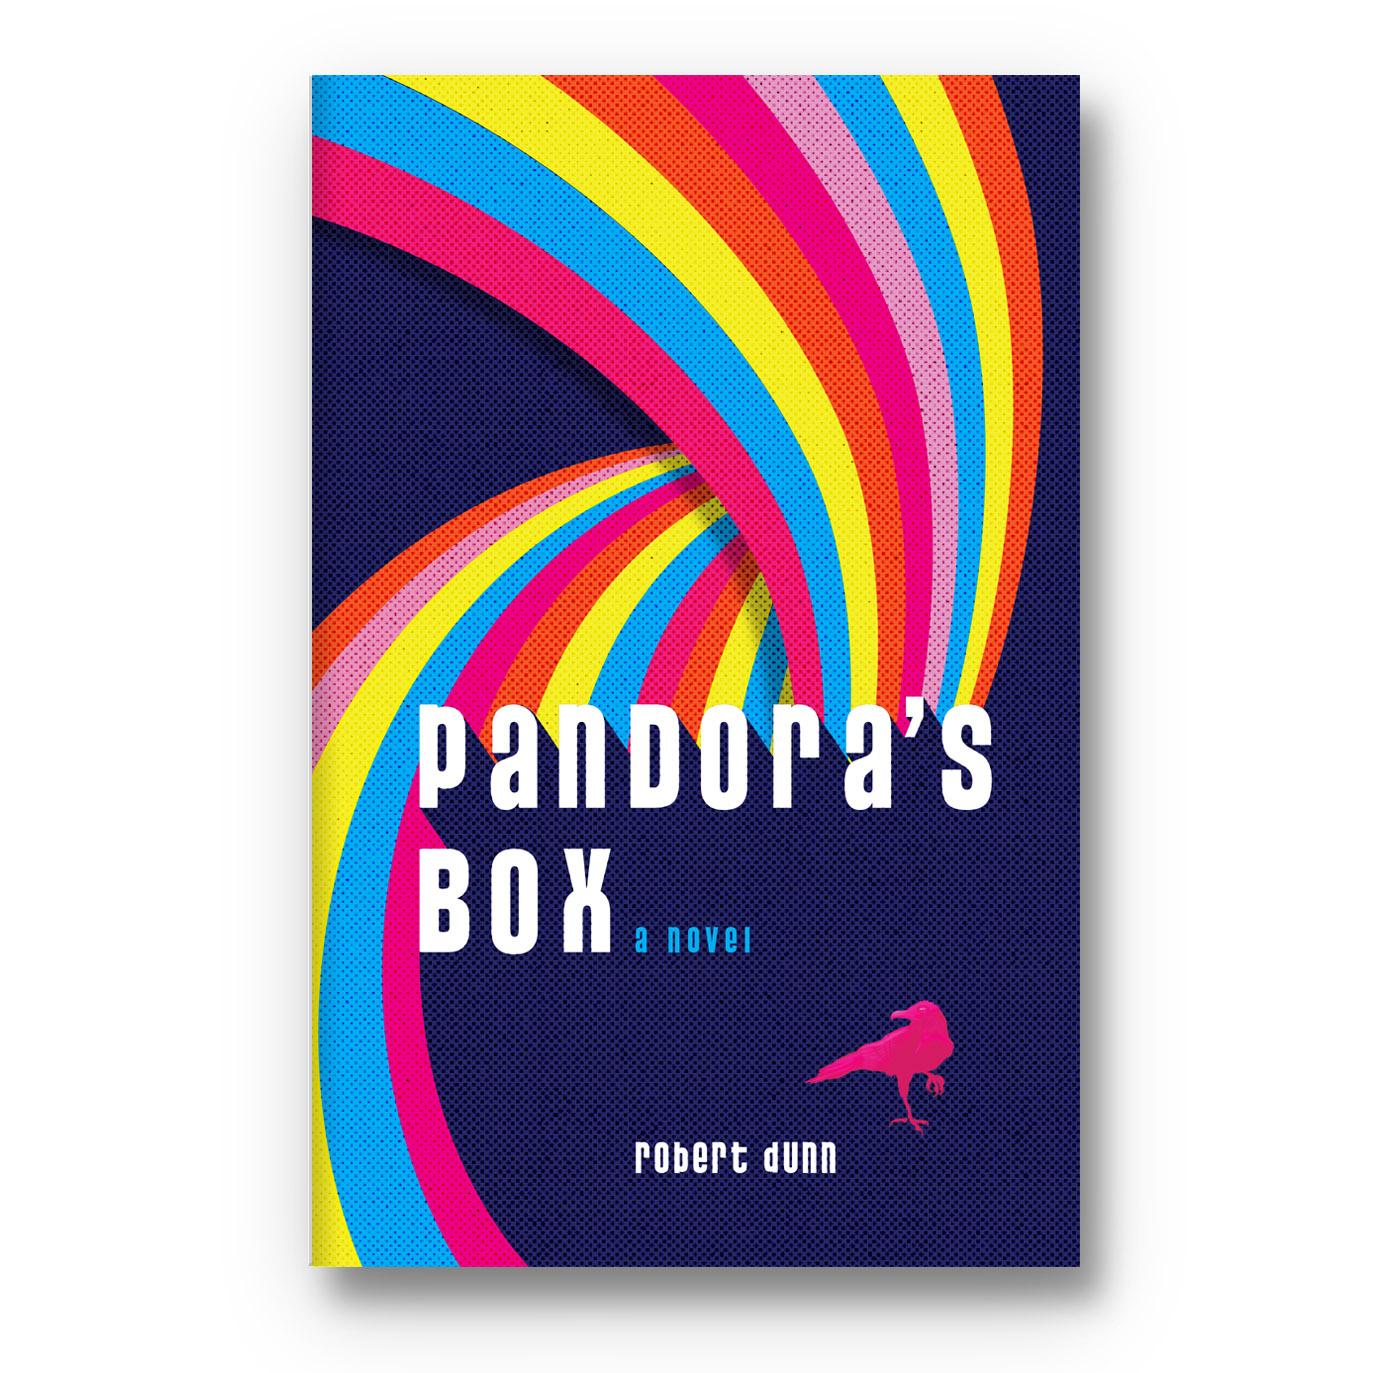 pandorasboxwhite.jpg